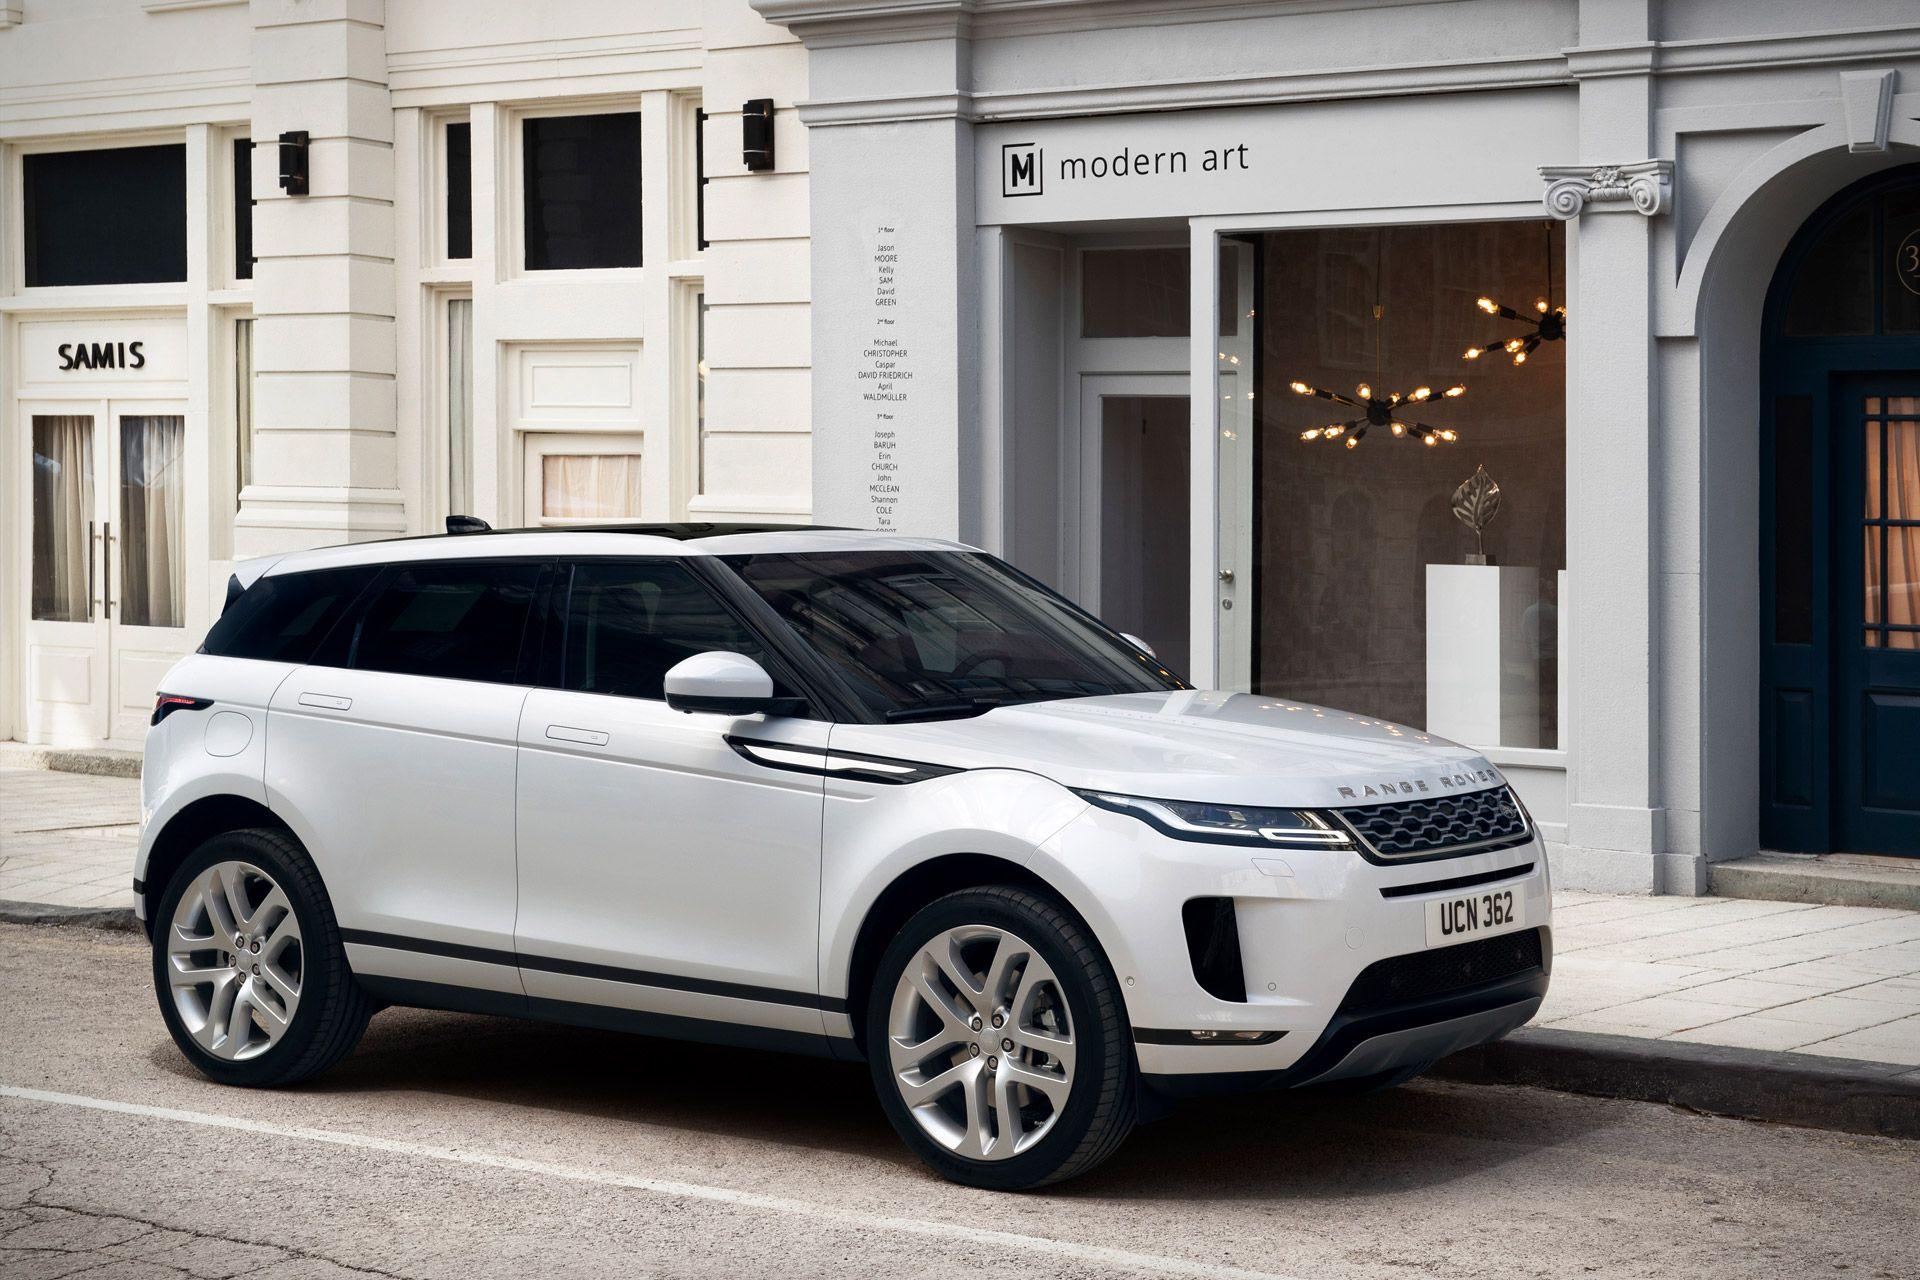 2020 Range Rover Evoque New Range Rover Evoque Range Rover Evoque Luxury Cars Range Rover